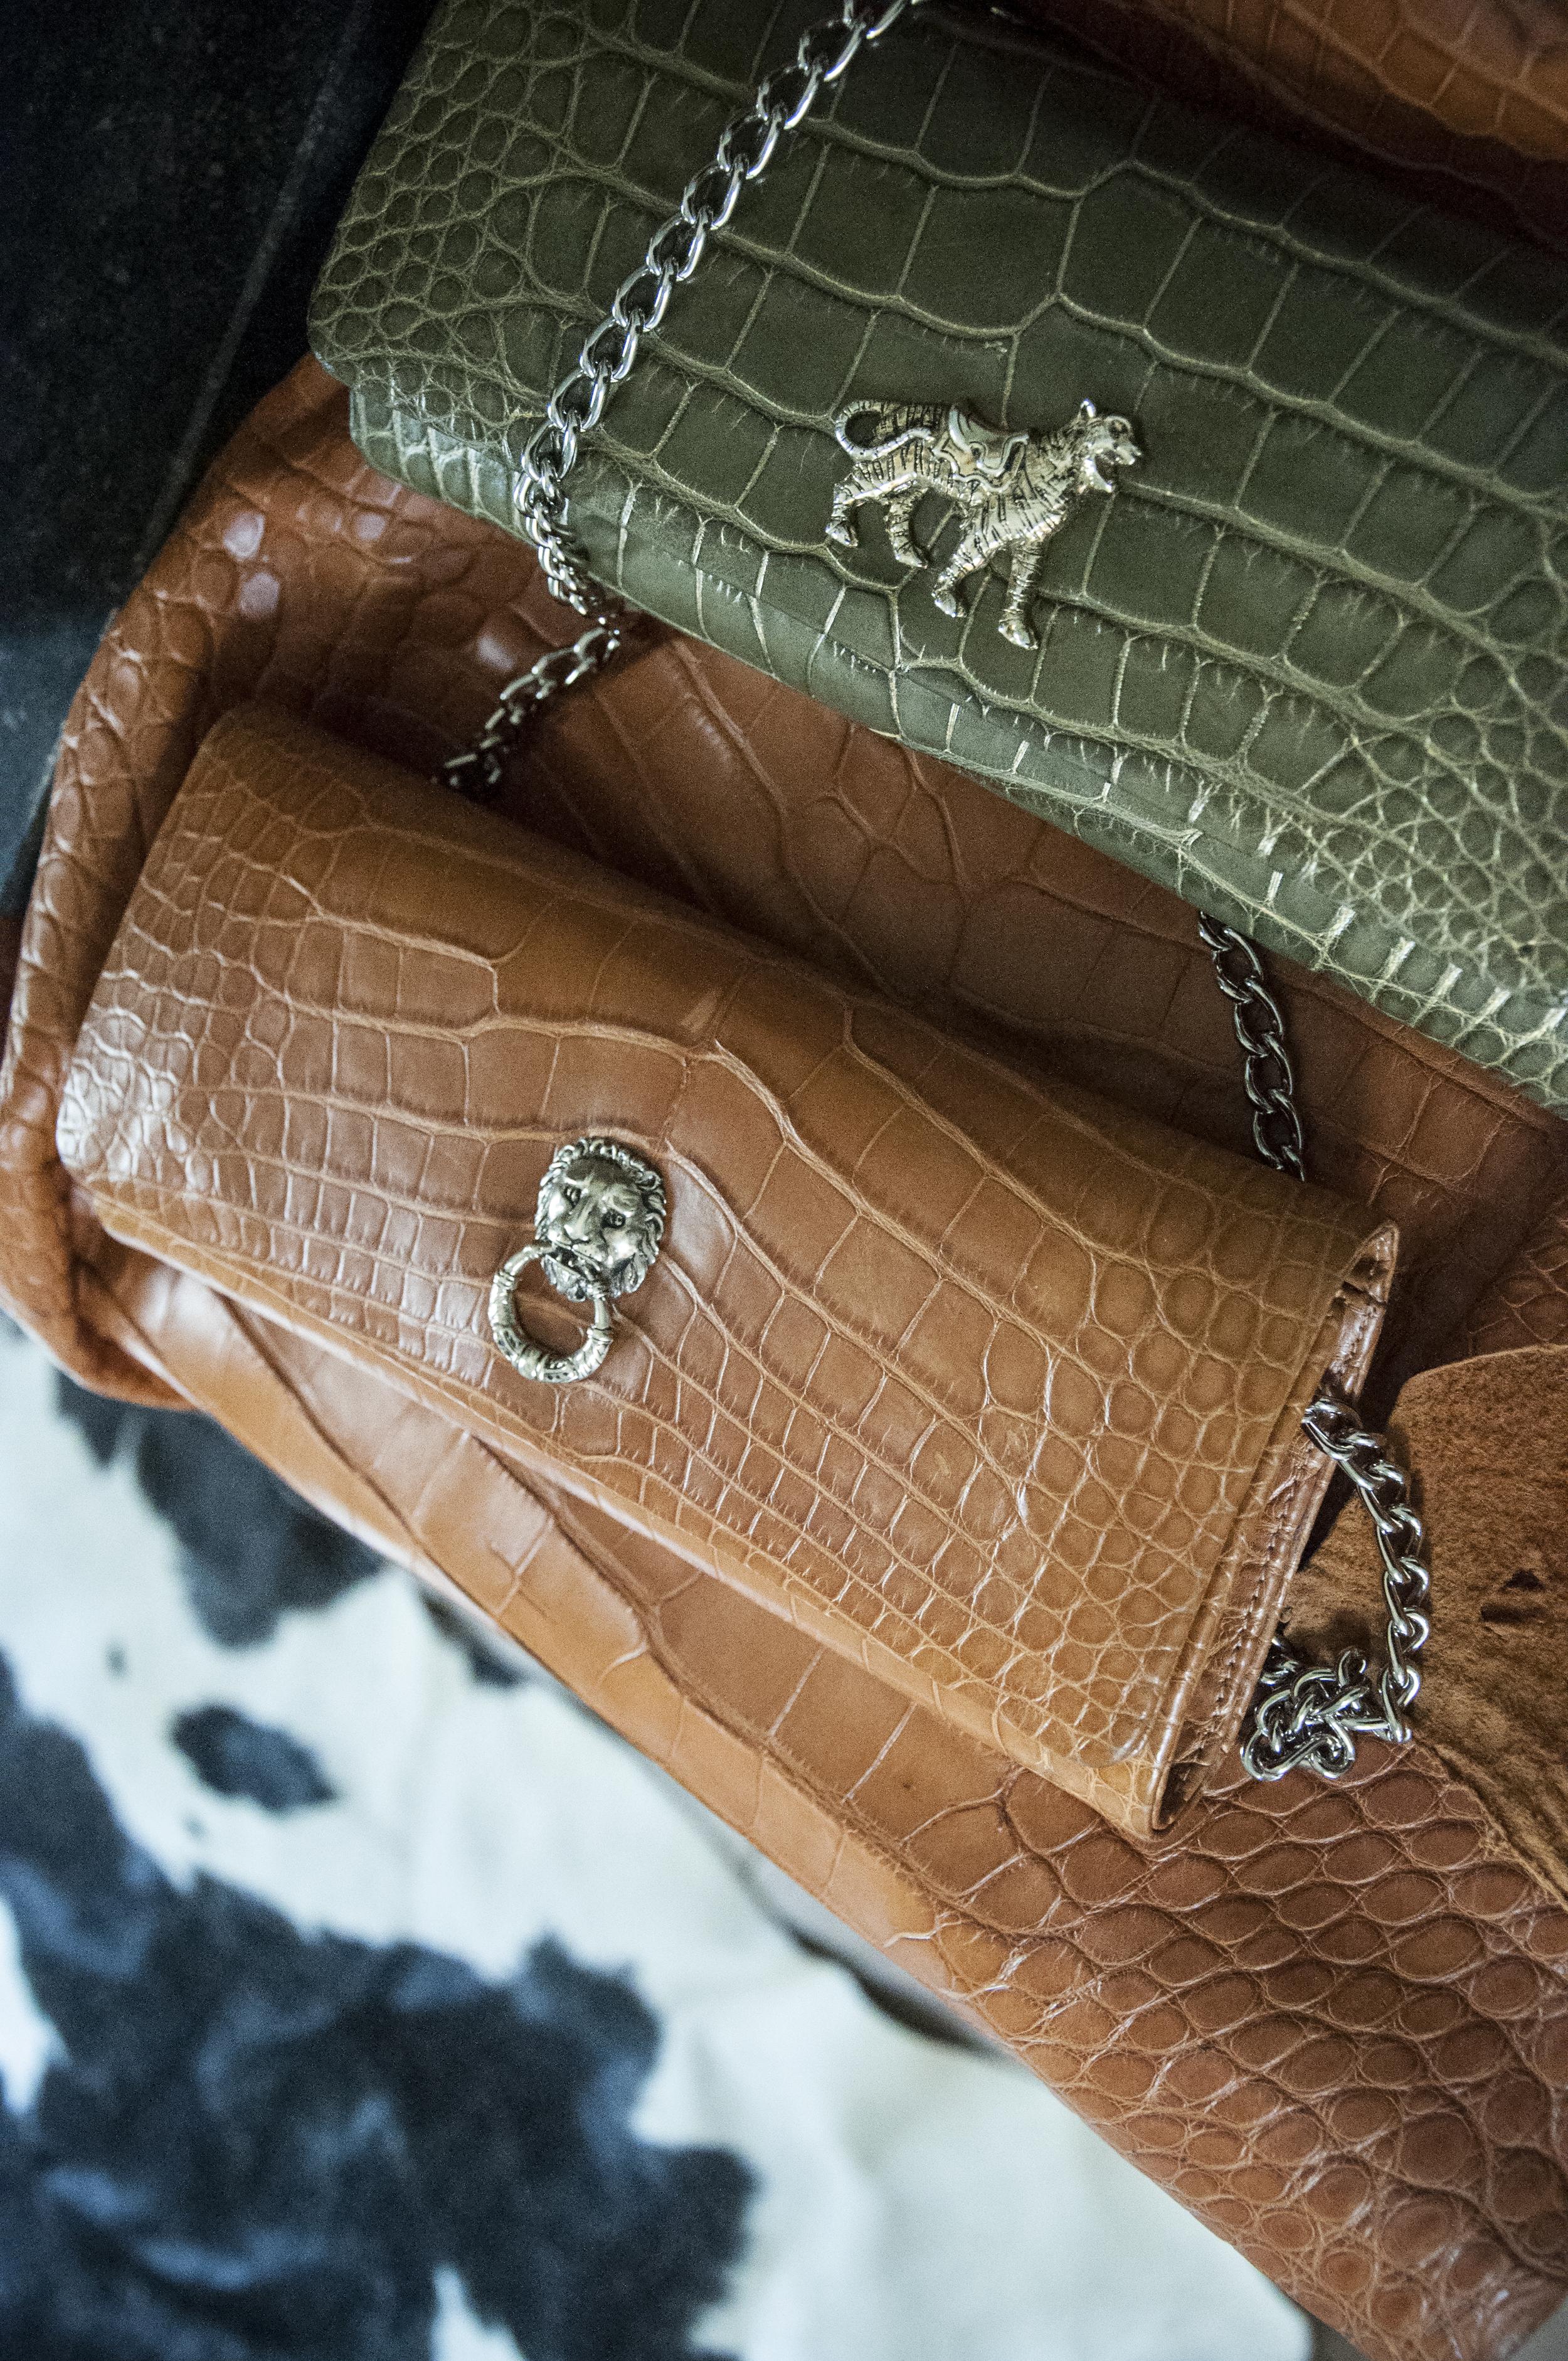 12 reagan charleston alligator bags.jpg